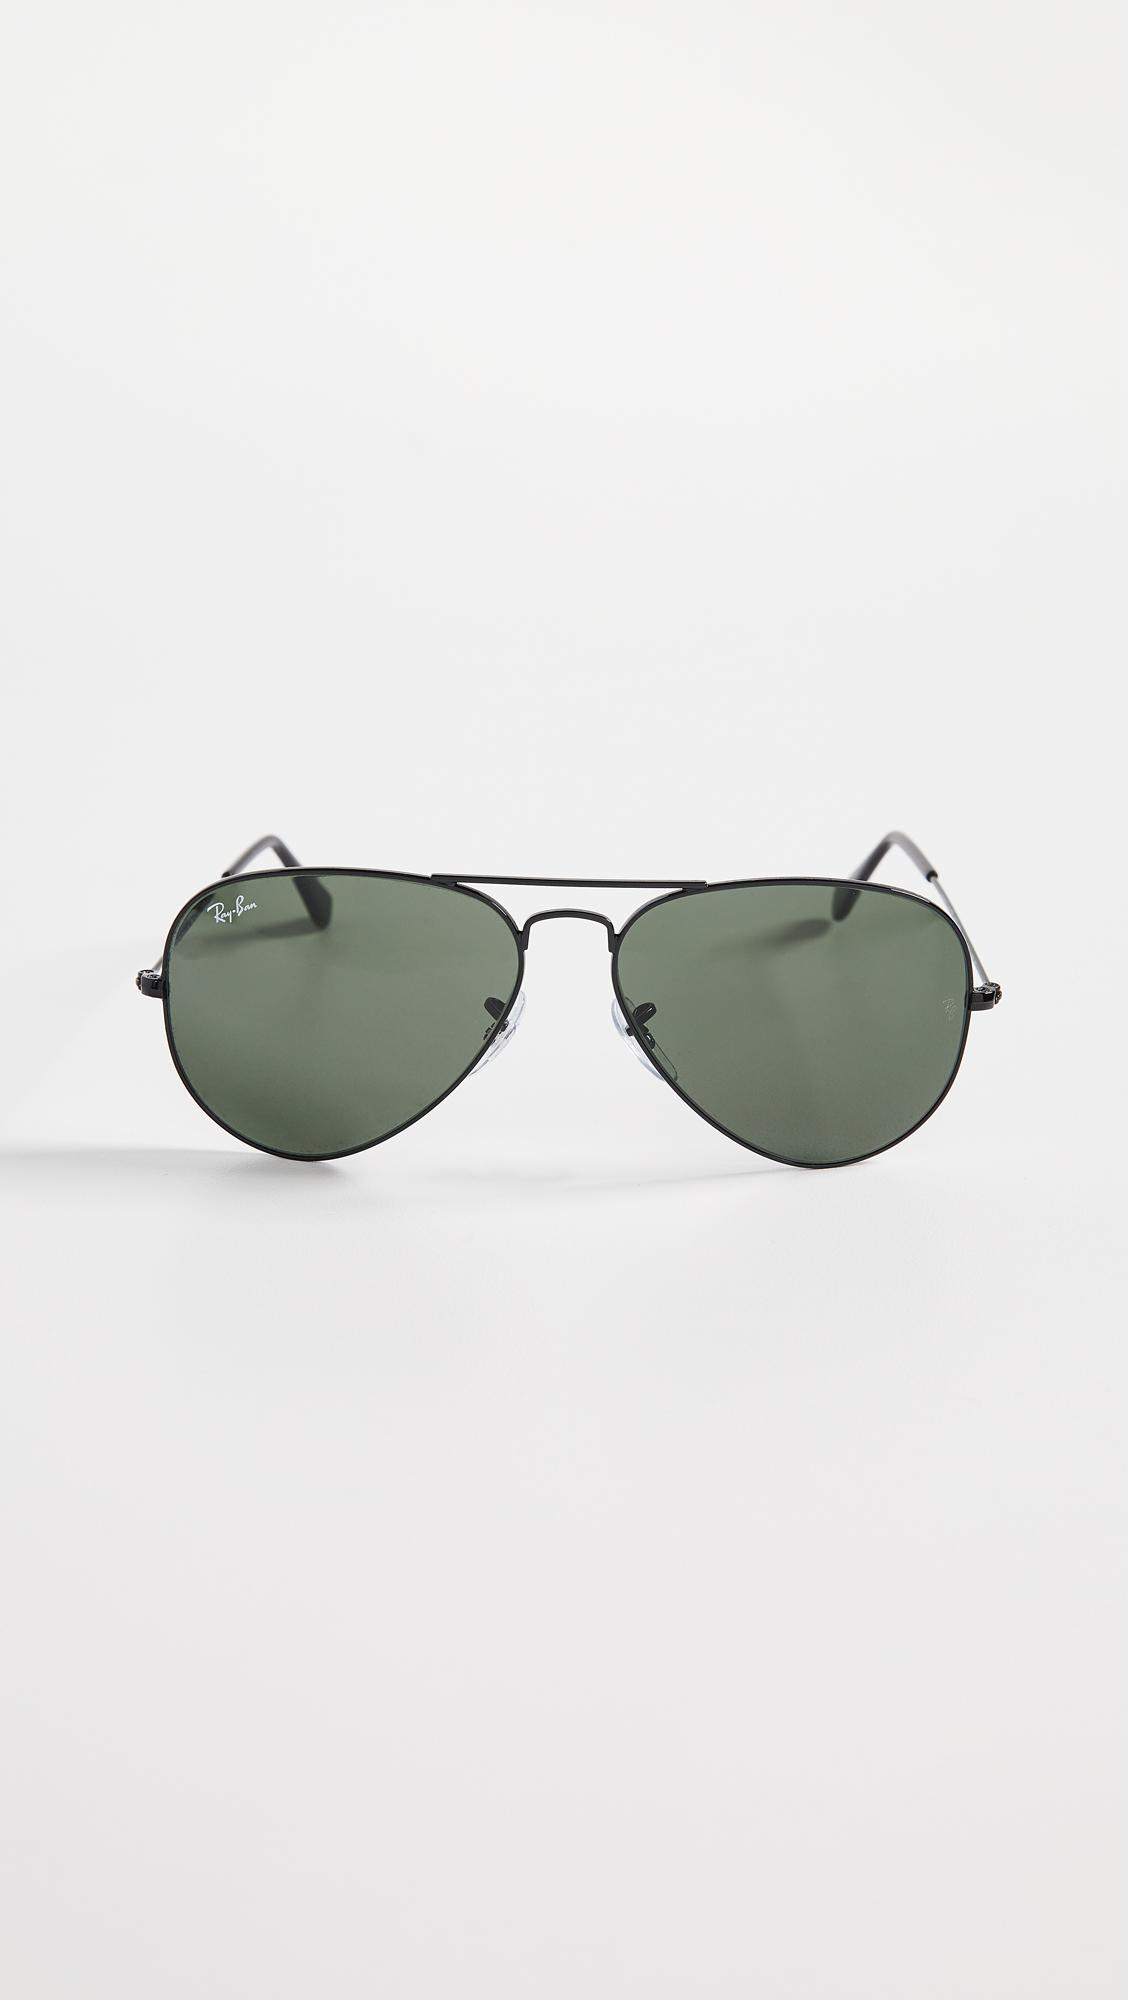 6ecdeade4bf Ray-Ban. Women s Black Rb3025 Oversized Classic Aviator Polarized Sunglasses